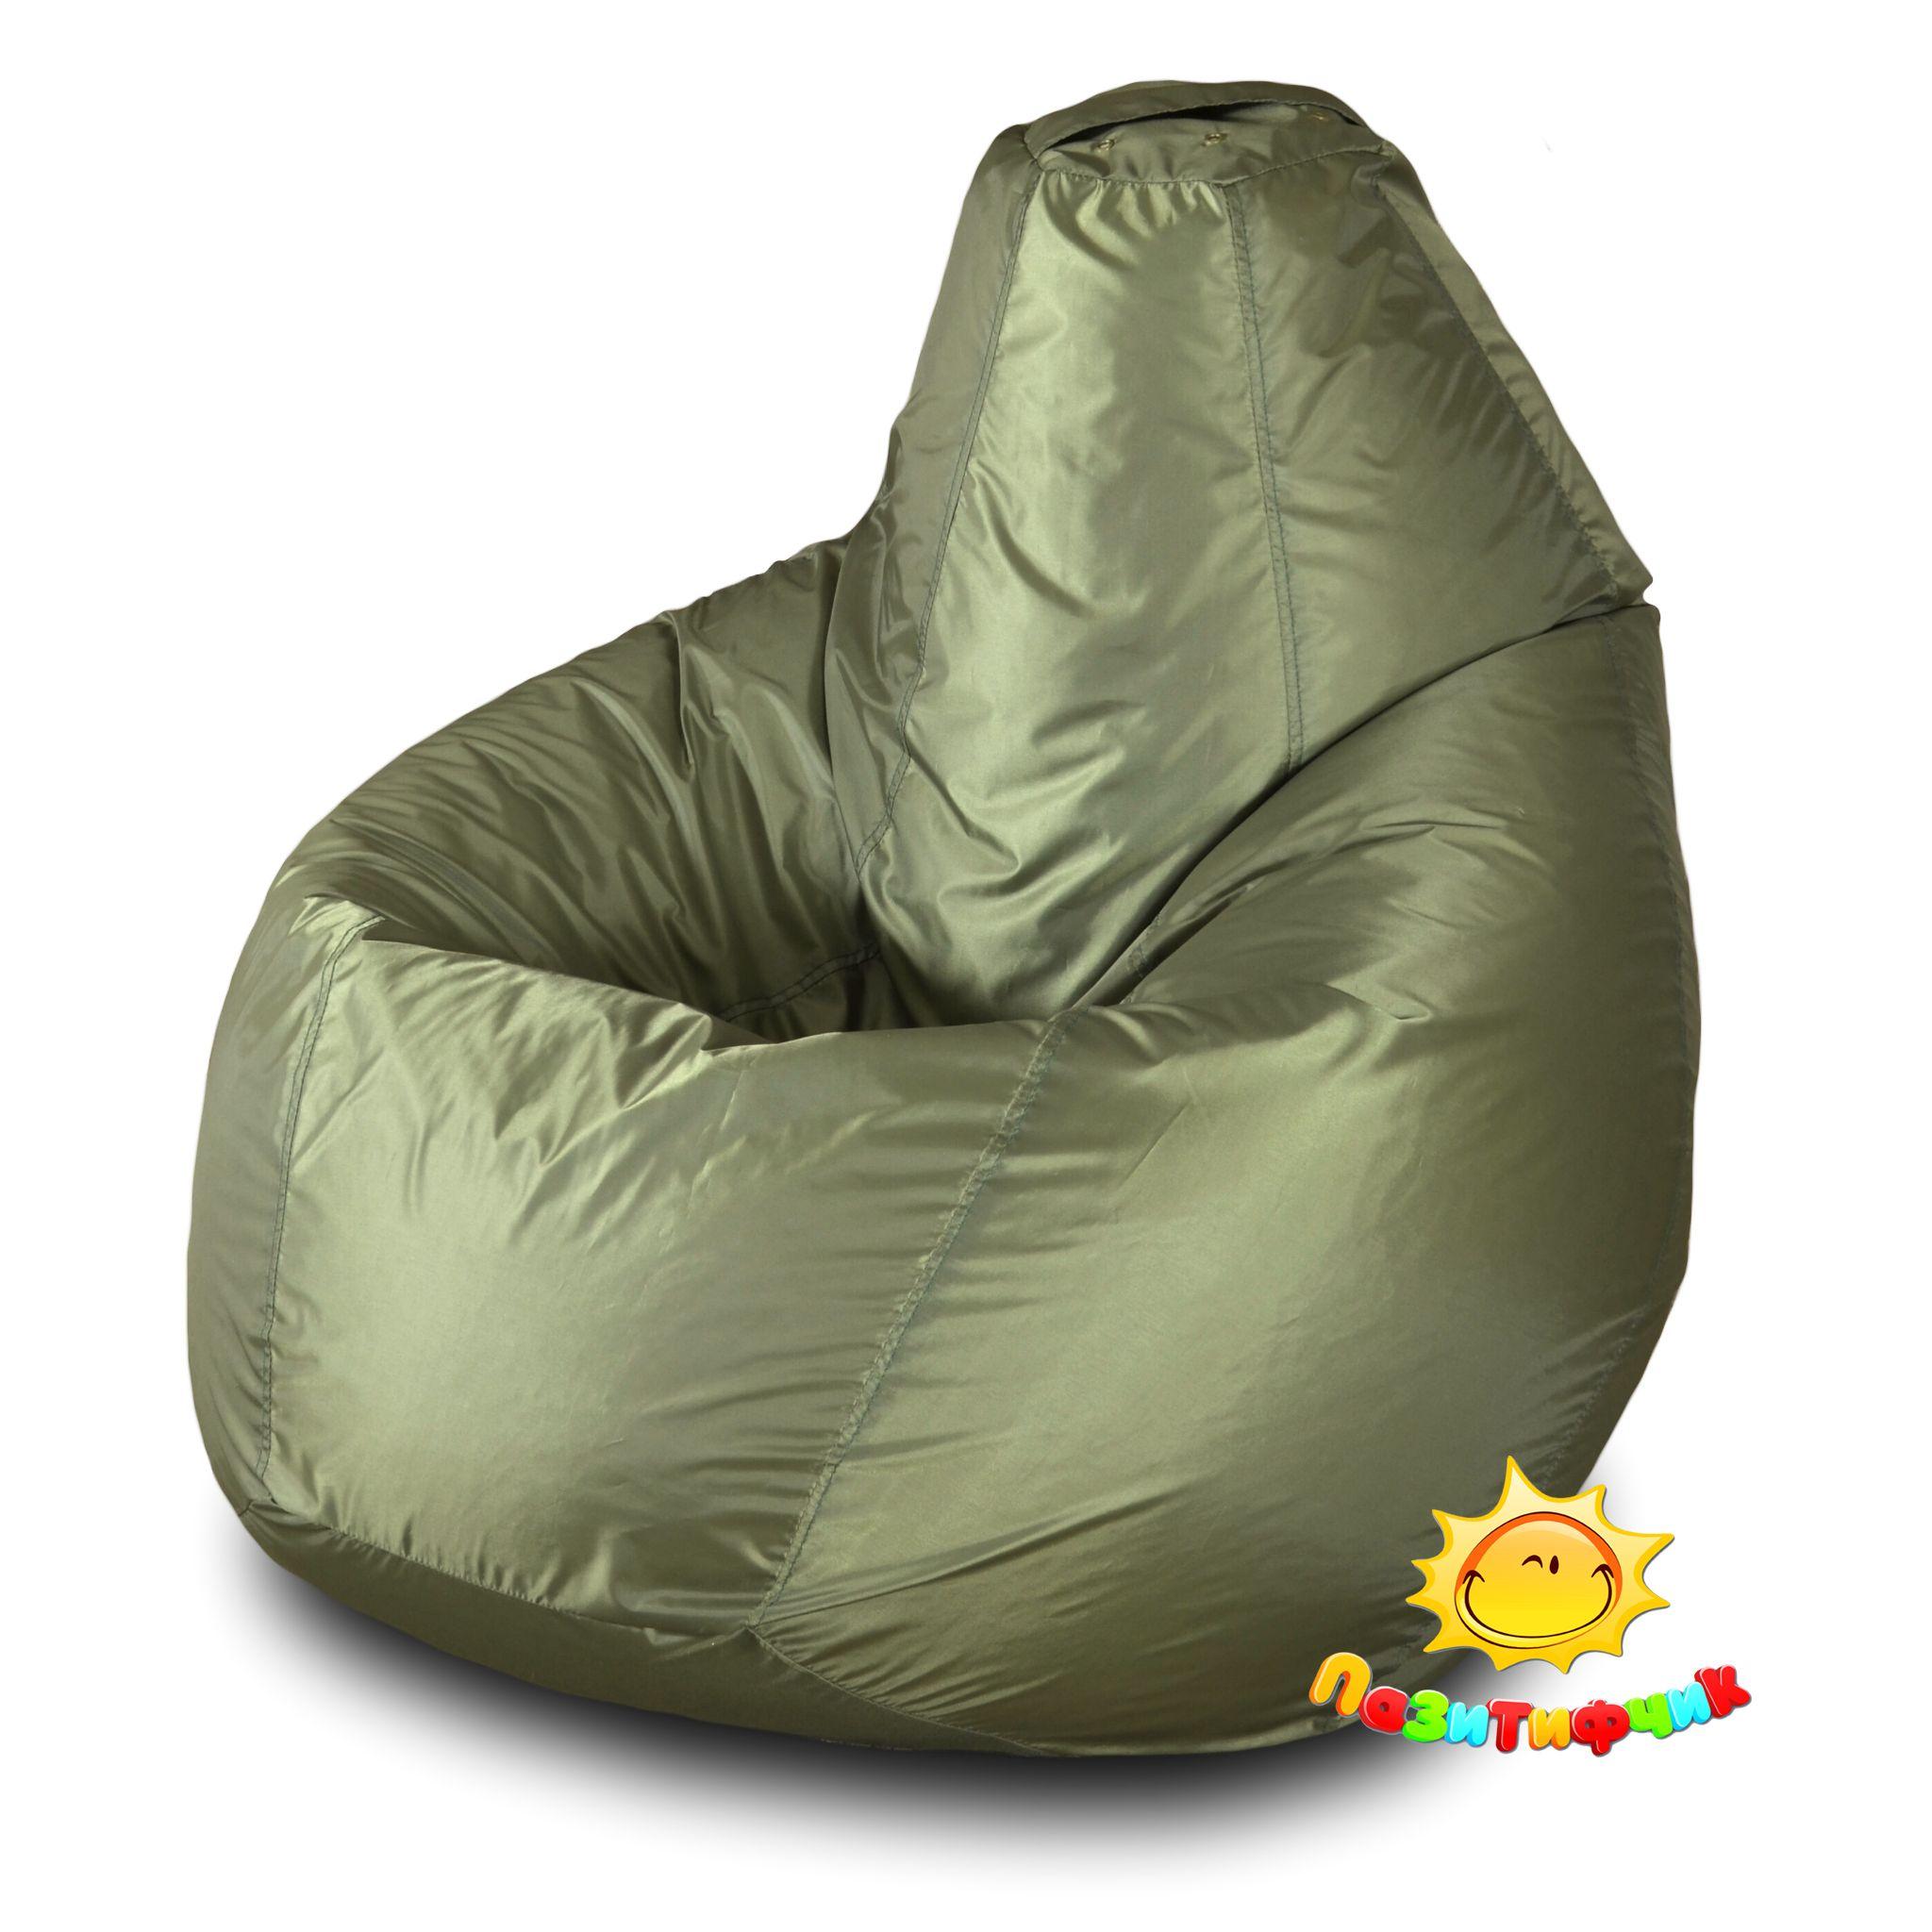 Кресло-мешок Pazitif Груша Пазитифчик Оксфорд, размер M, оксфорд, хаки